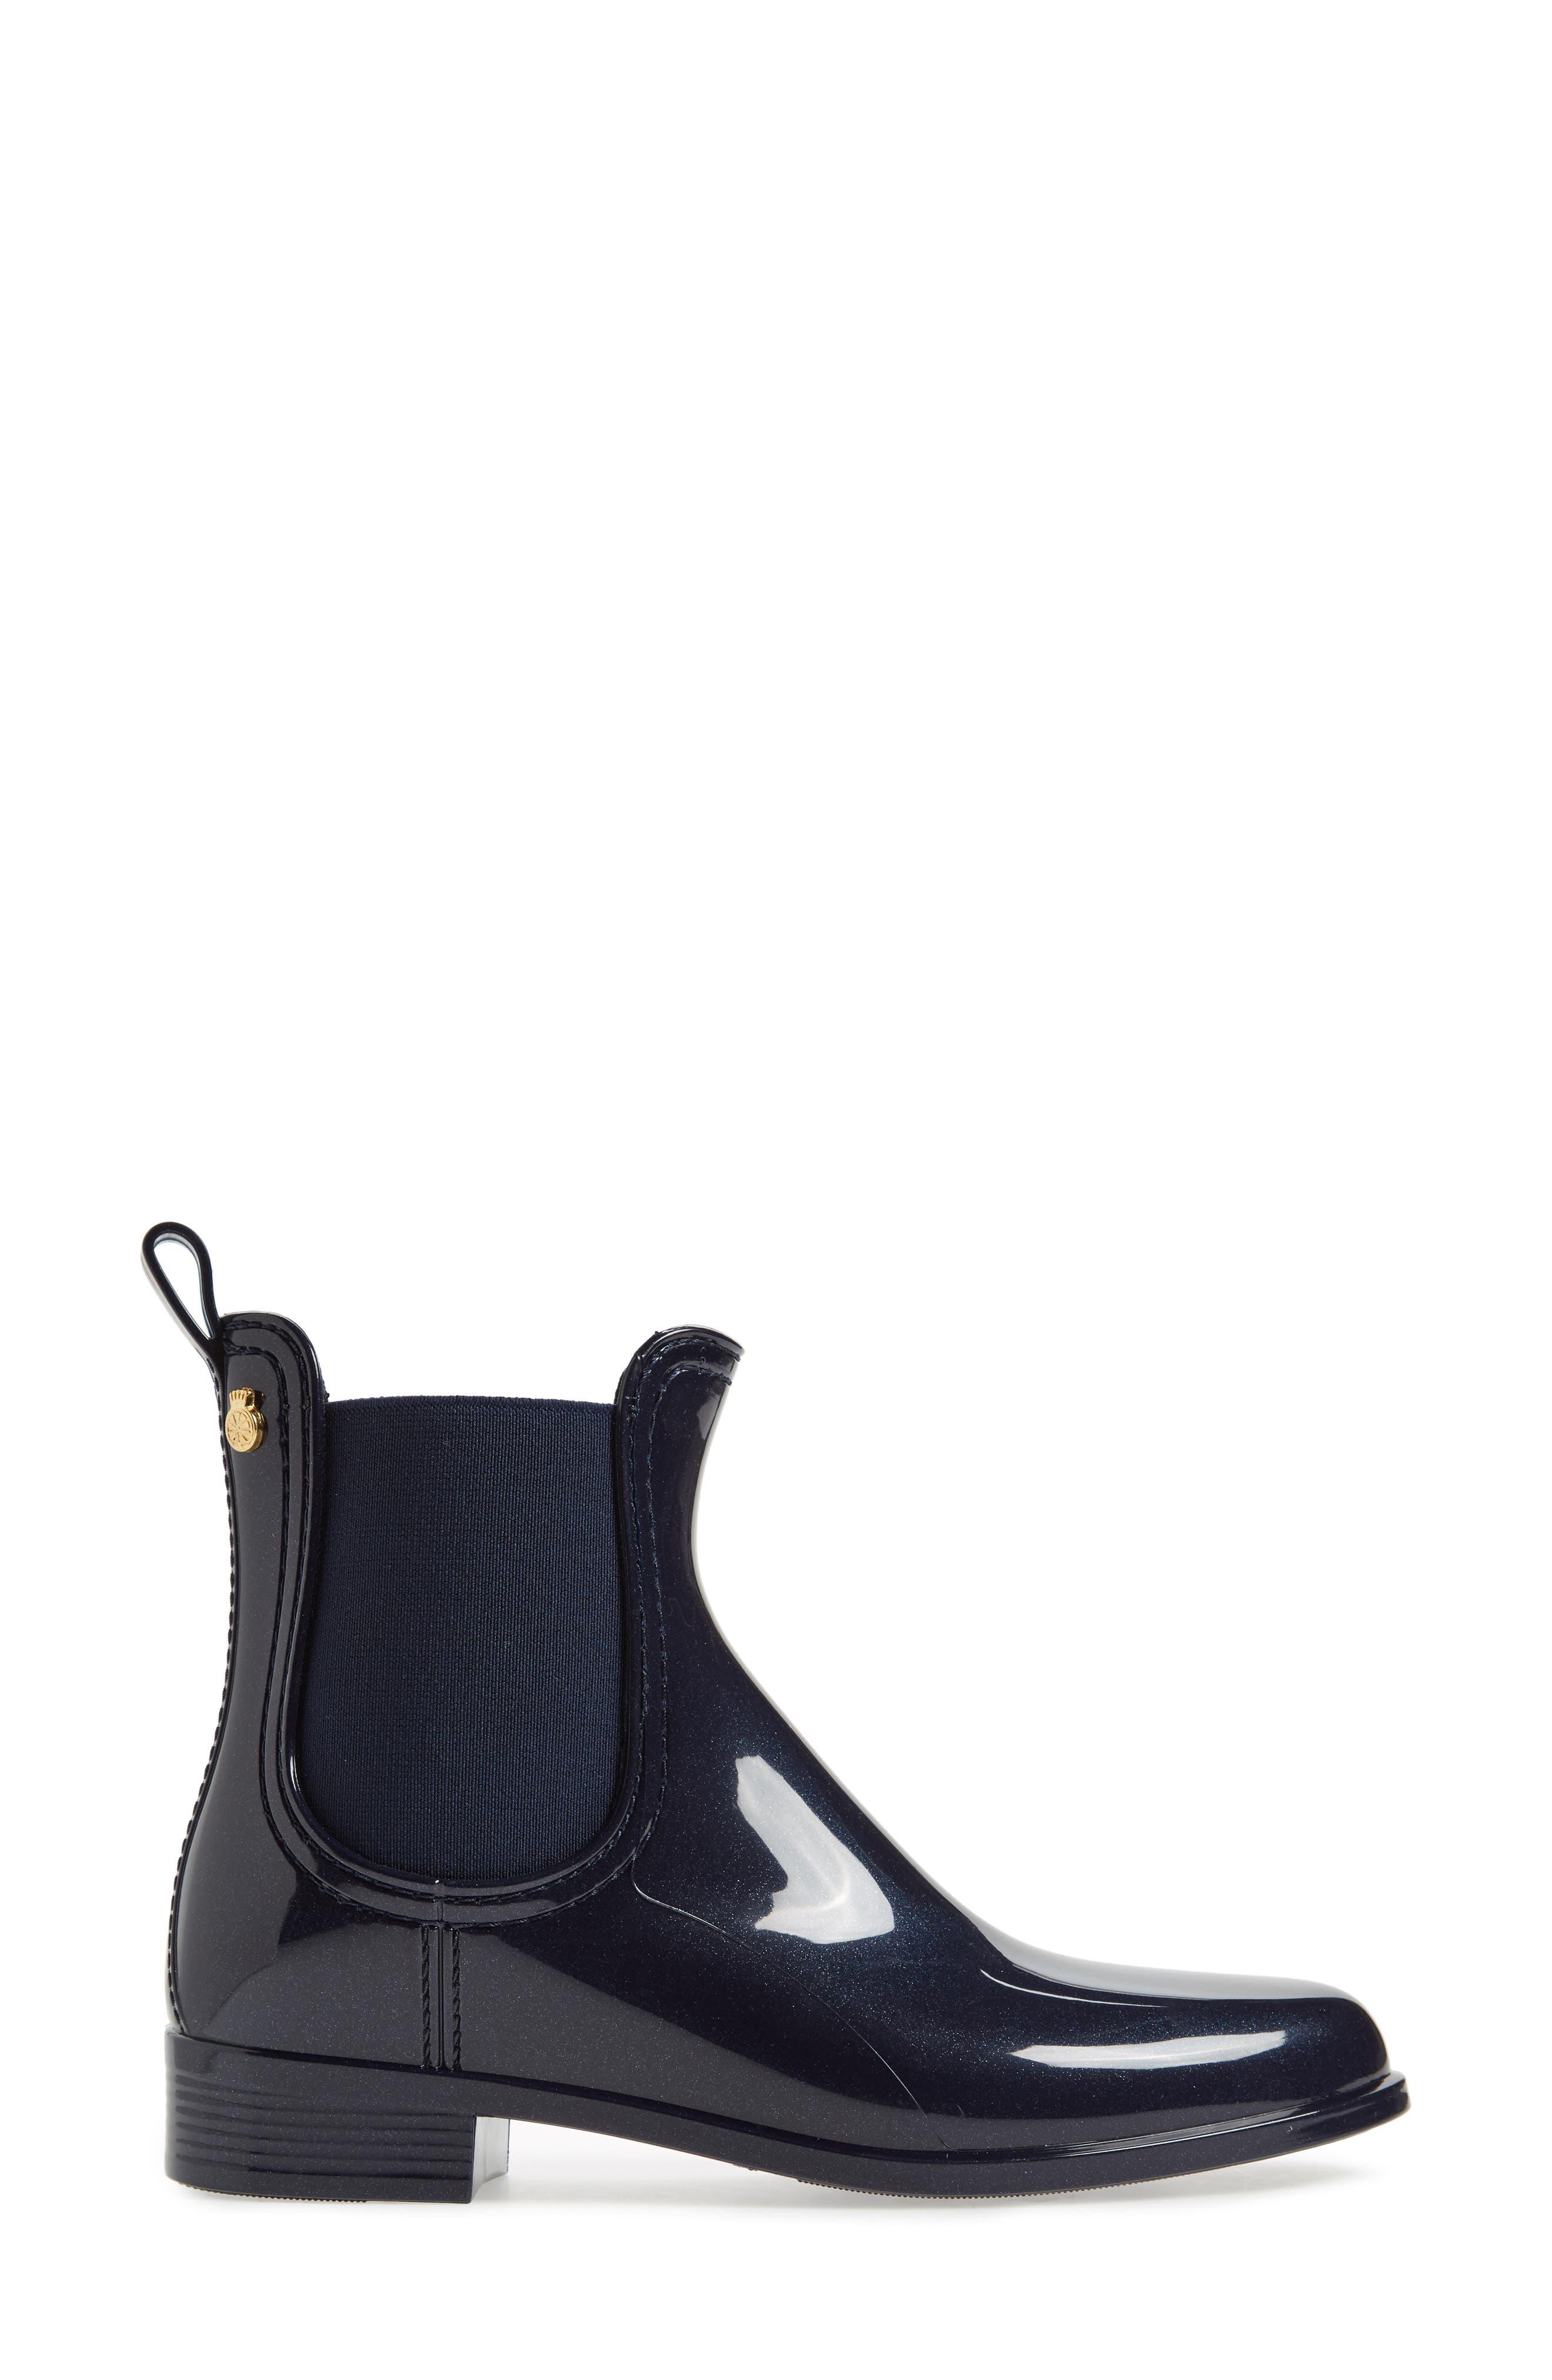 Alternate Image 3  - Lemon Jelly Comfy Waterproof Chelsea Boot (Women)